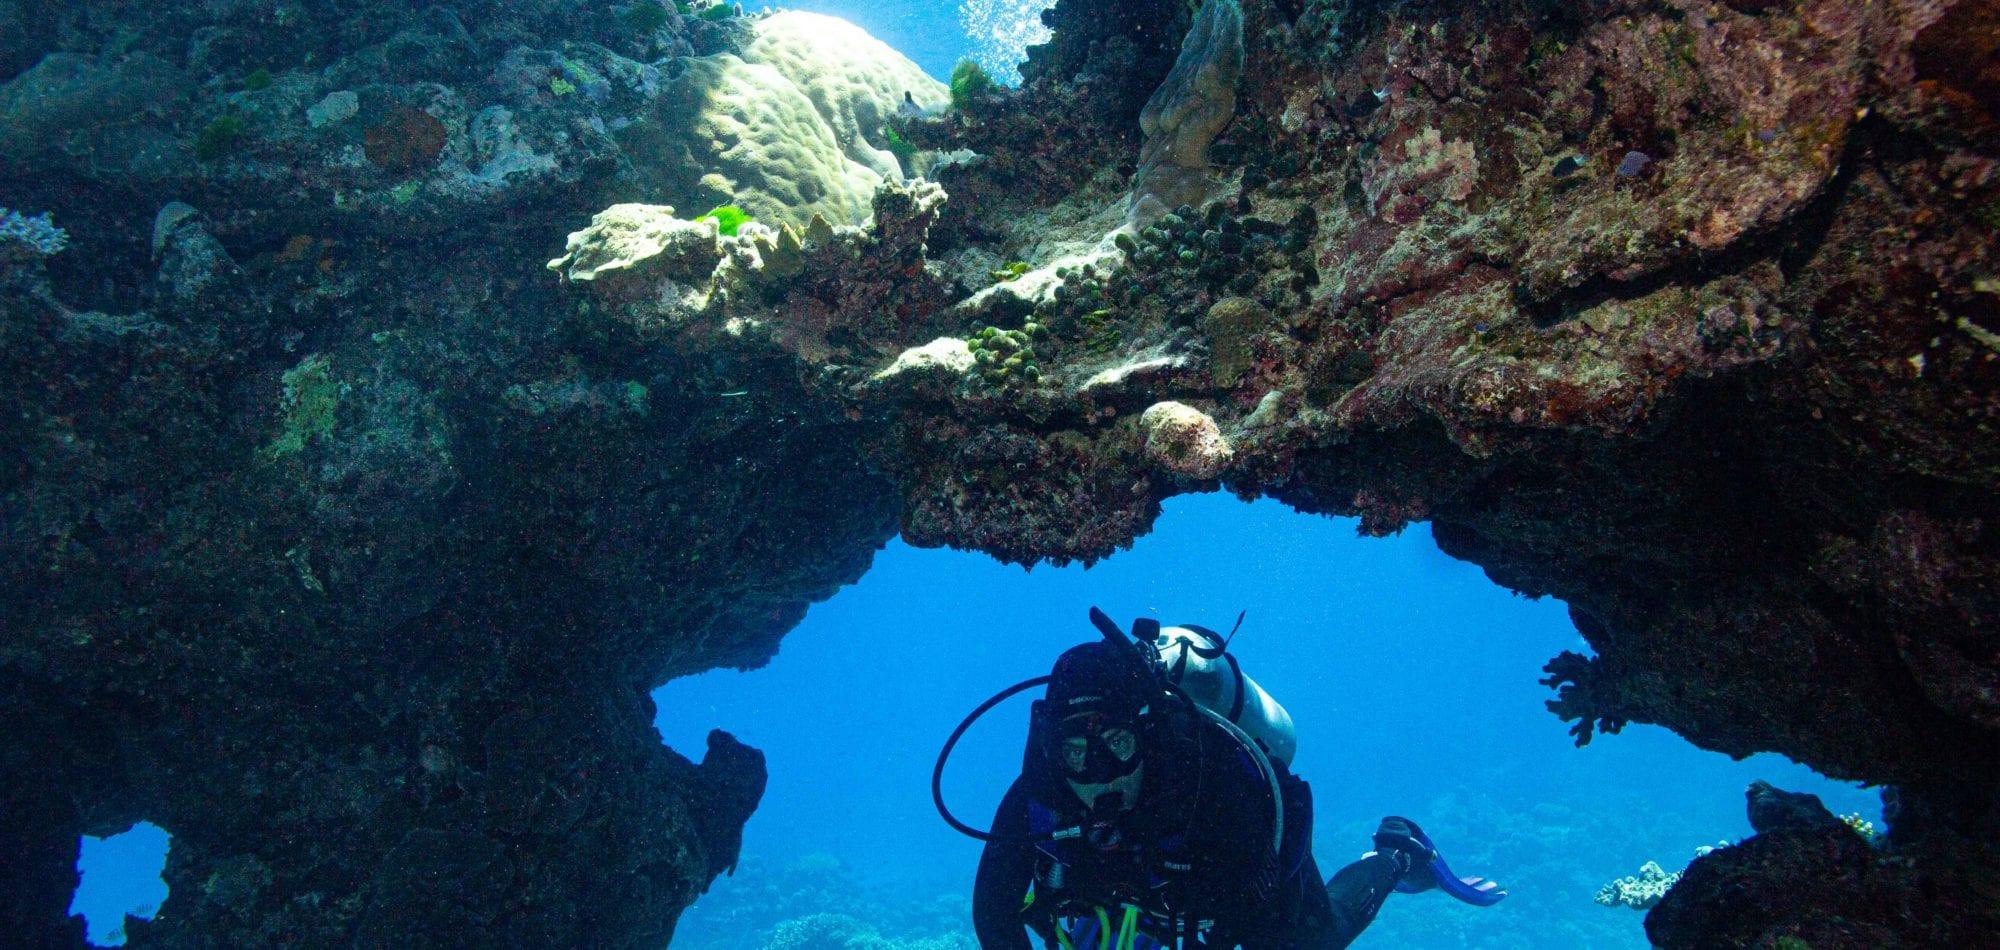 Cairns scuba diving day trip - scuba diver going through swim-through -